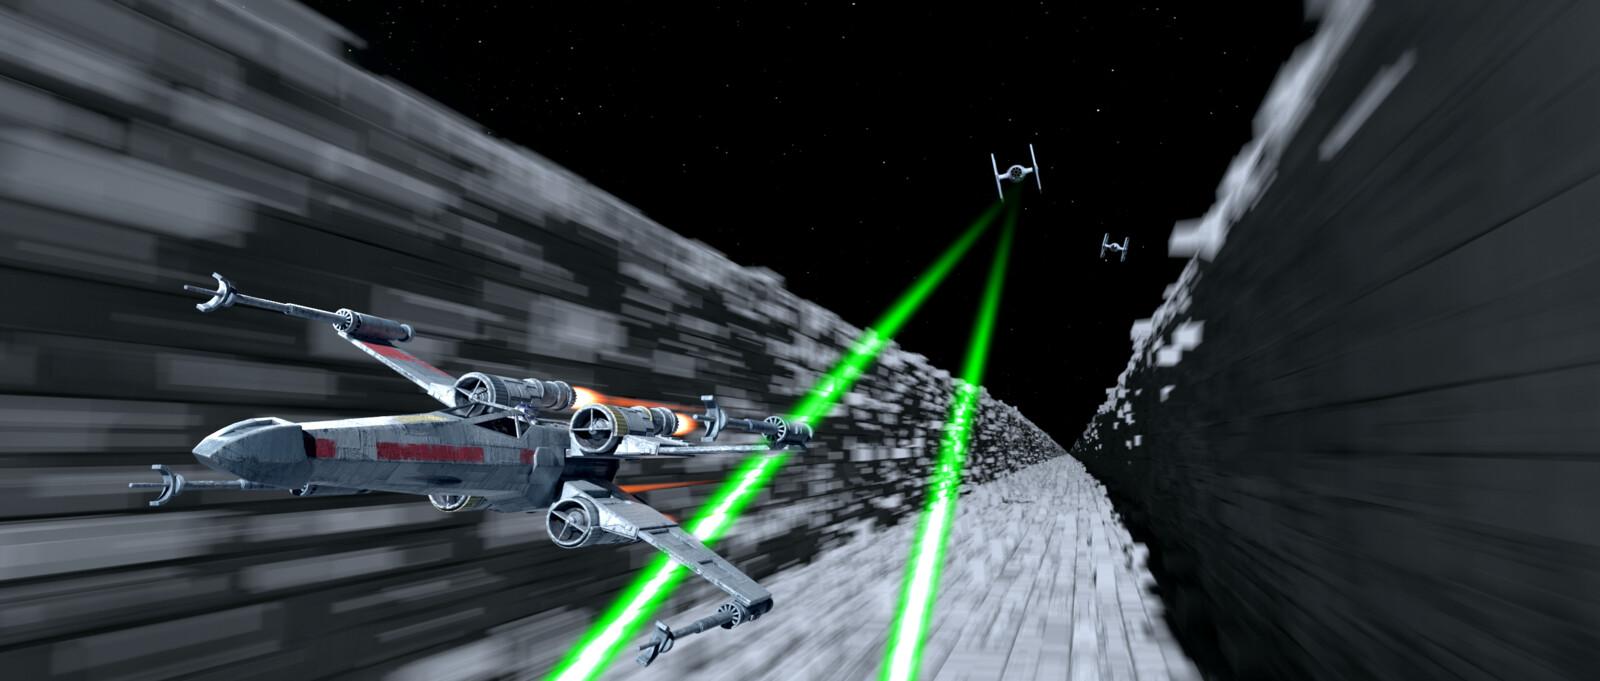 Star Wars X-Wing Recreation